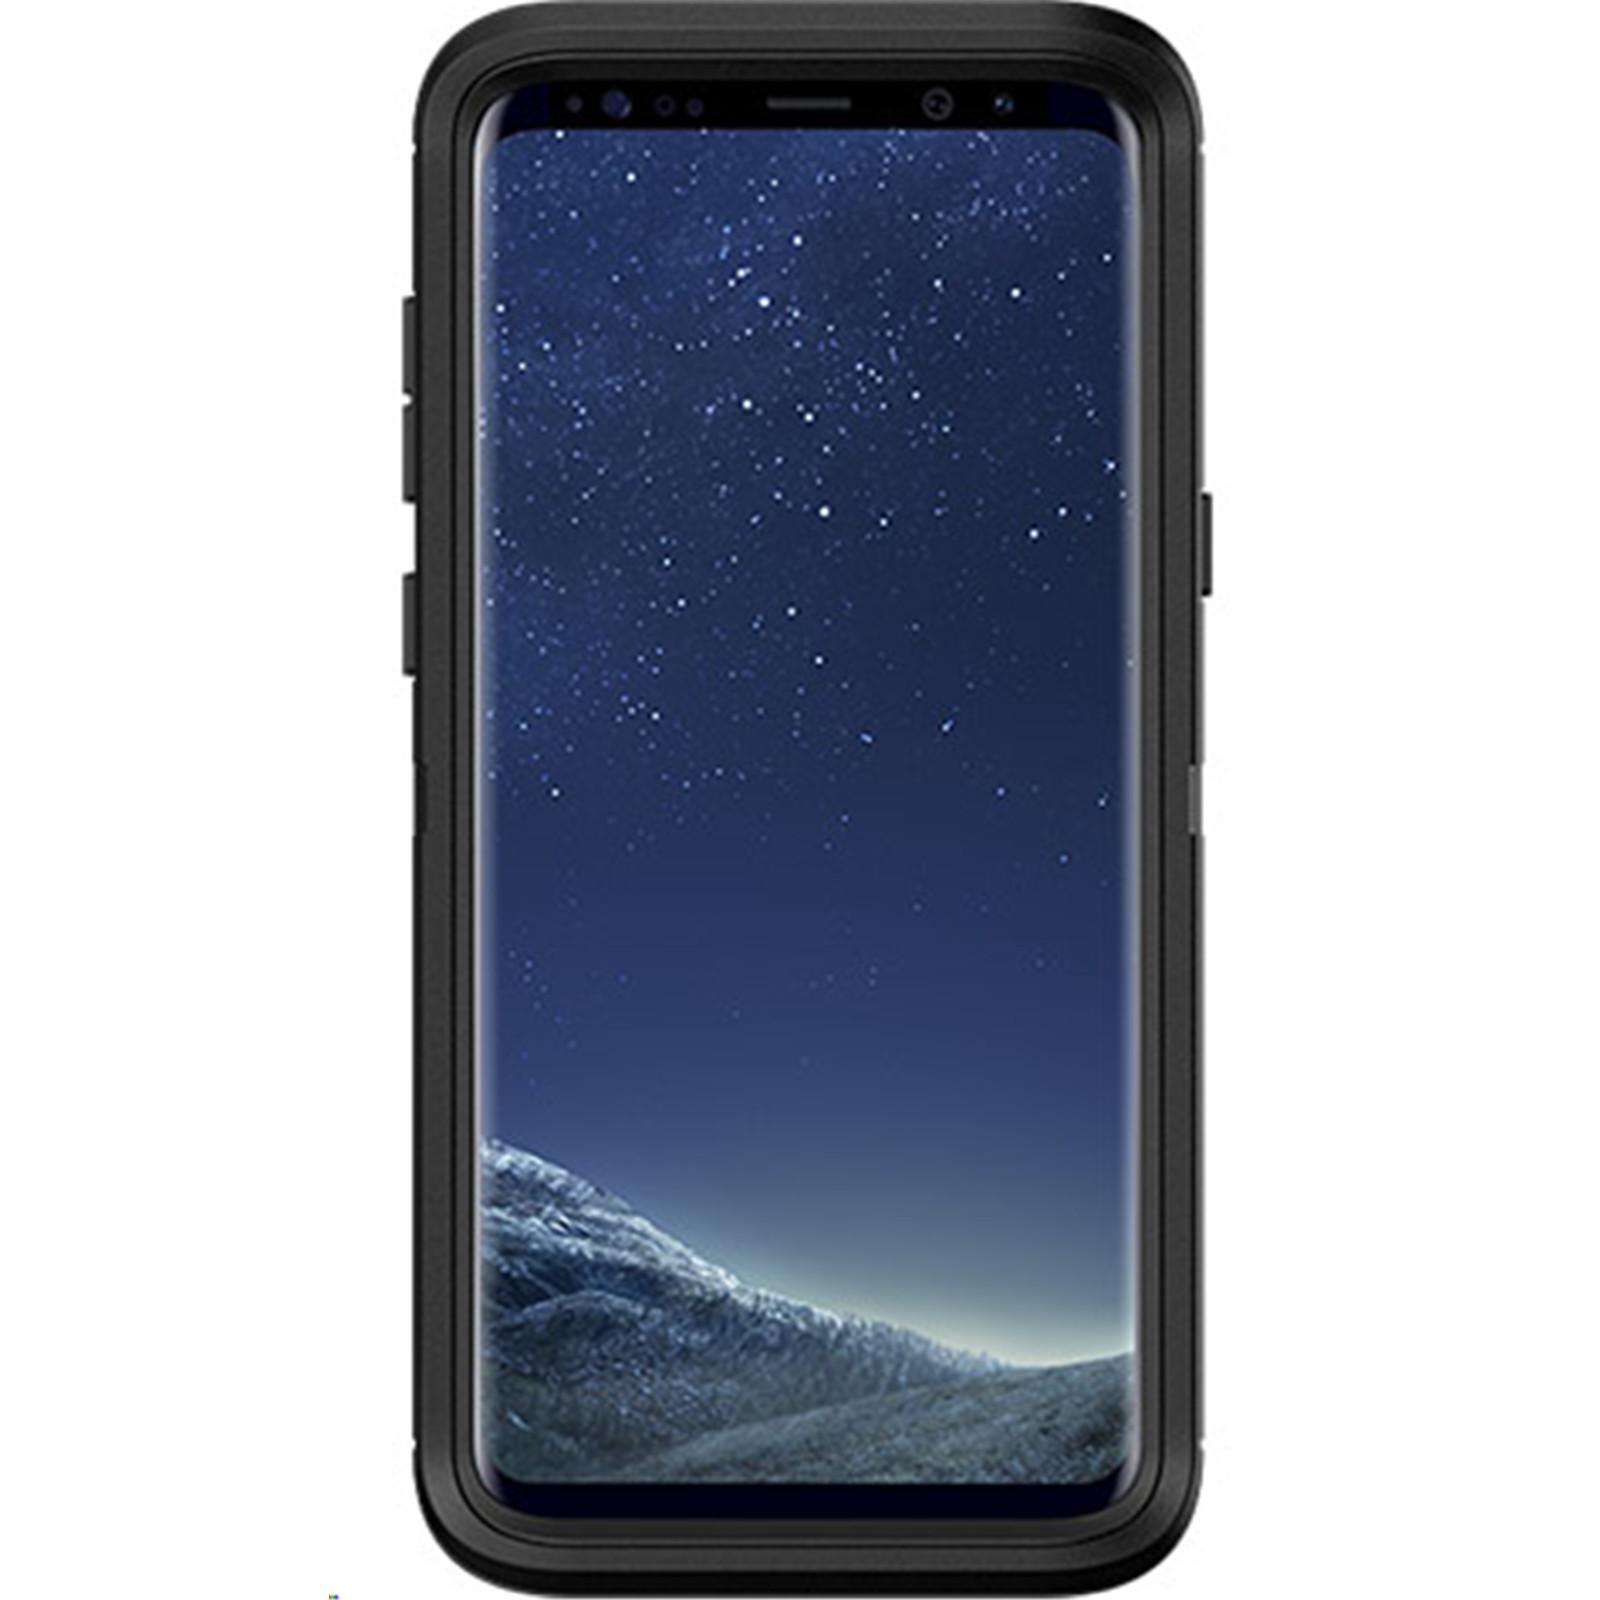 premium selection 0e4a1 18fa6 Buy the OtterBox Galaxy S8+ Defender Case Black,OtterBox Certified ...